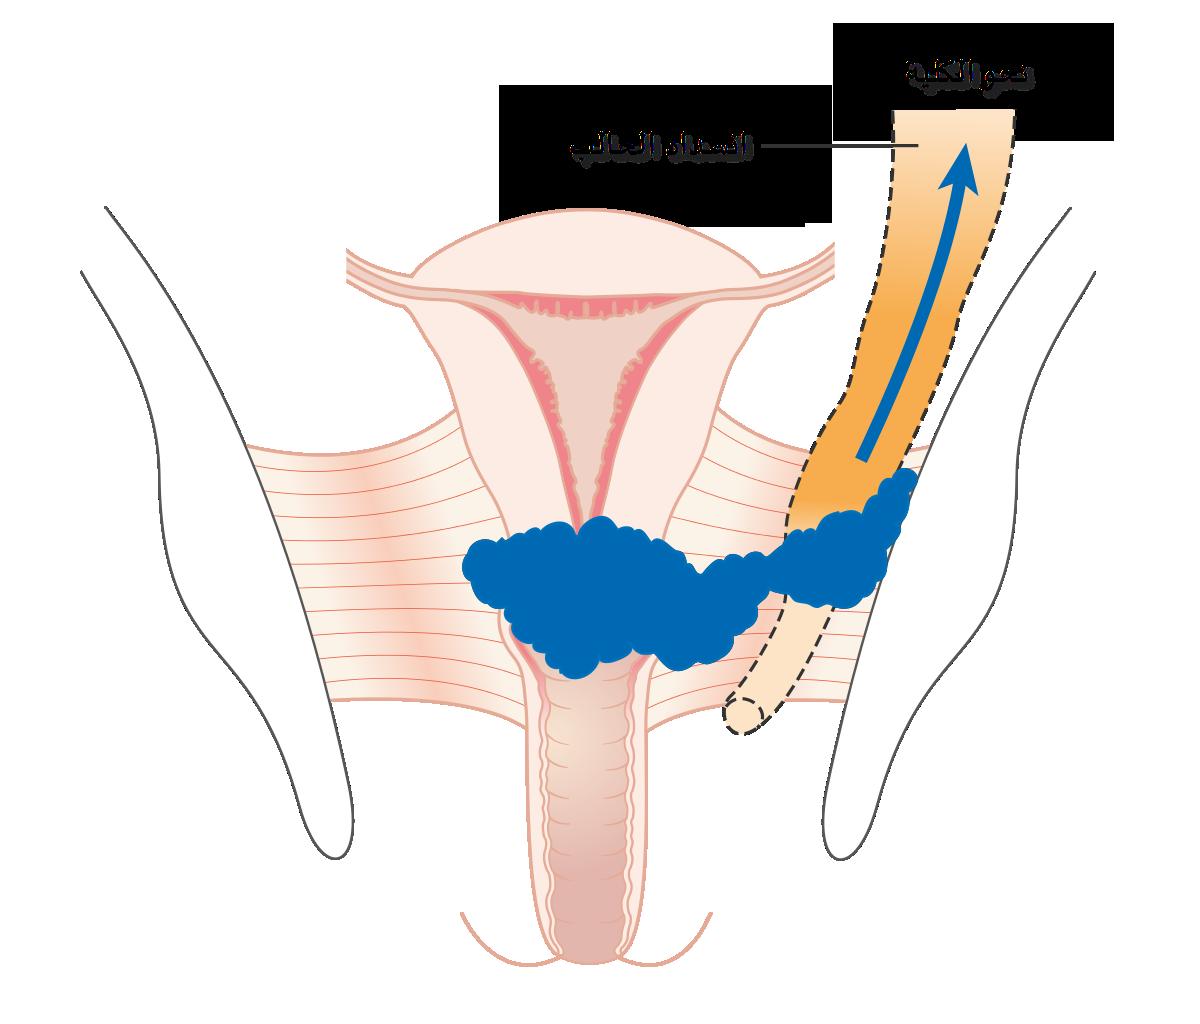 Filediagram showing stage 3b cervical cancer cruk 226 arg filediagram showing stage 3b cervical cancer cruk 226 arg ccuart Choice Image